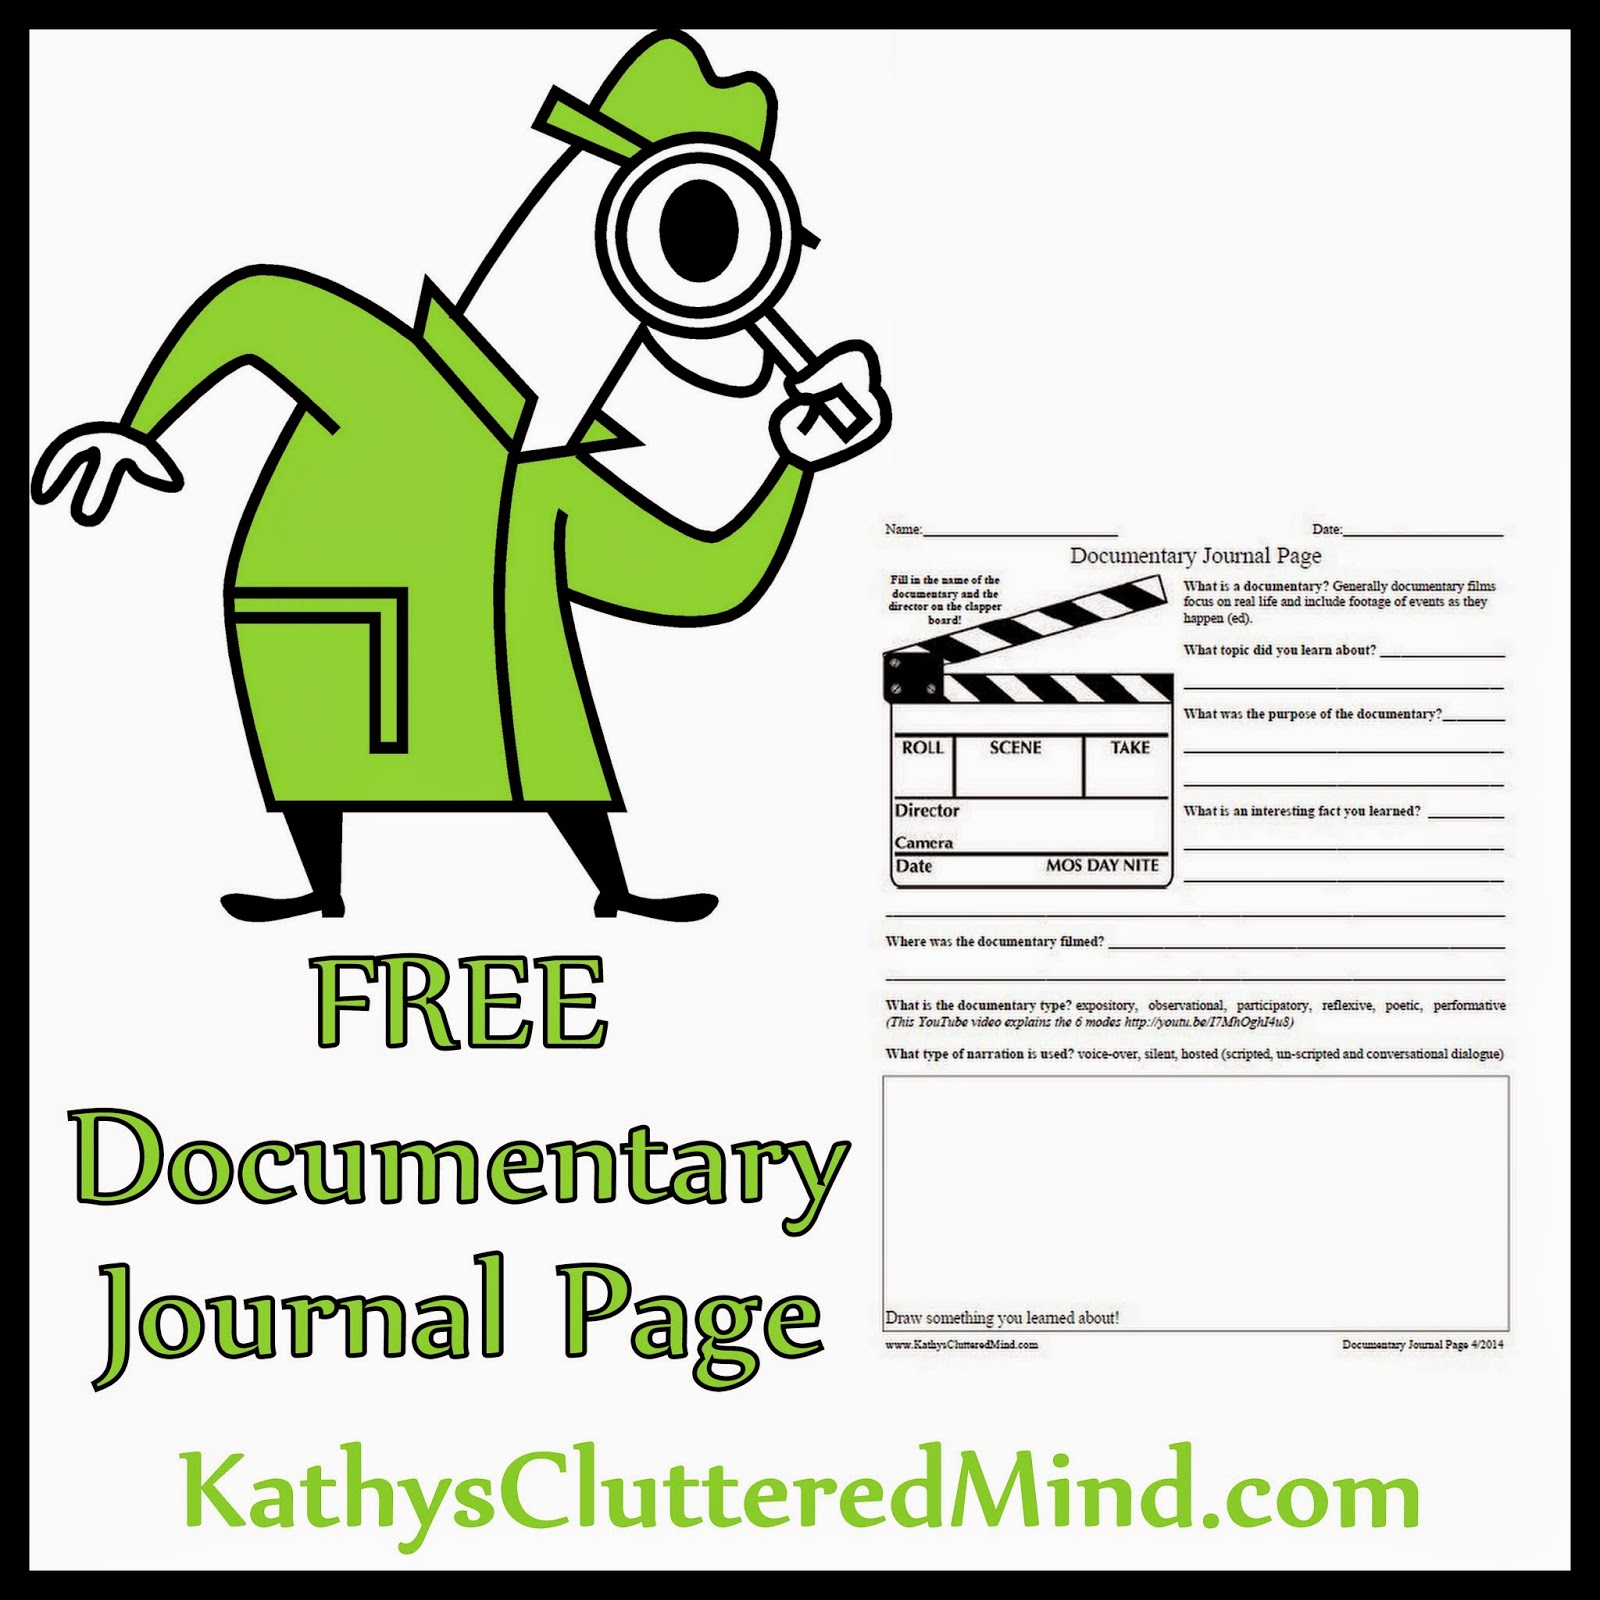 Kathys Cluttered Mind: Revolutionary War Films For Children